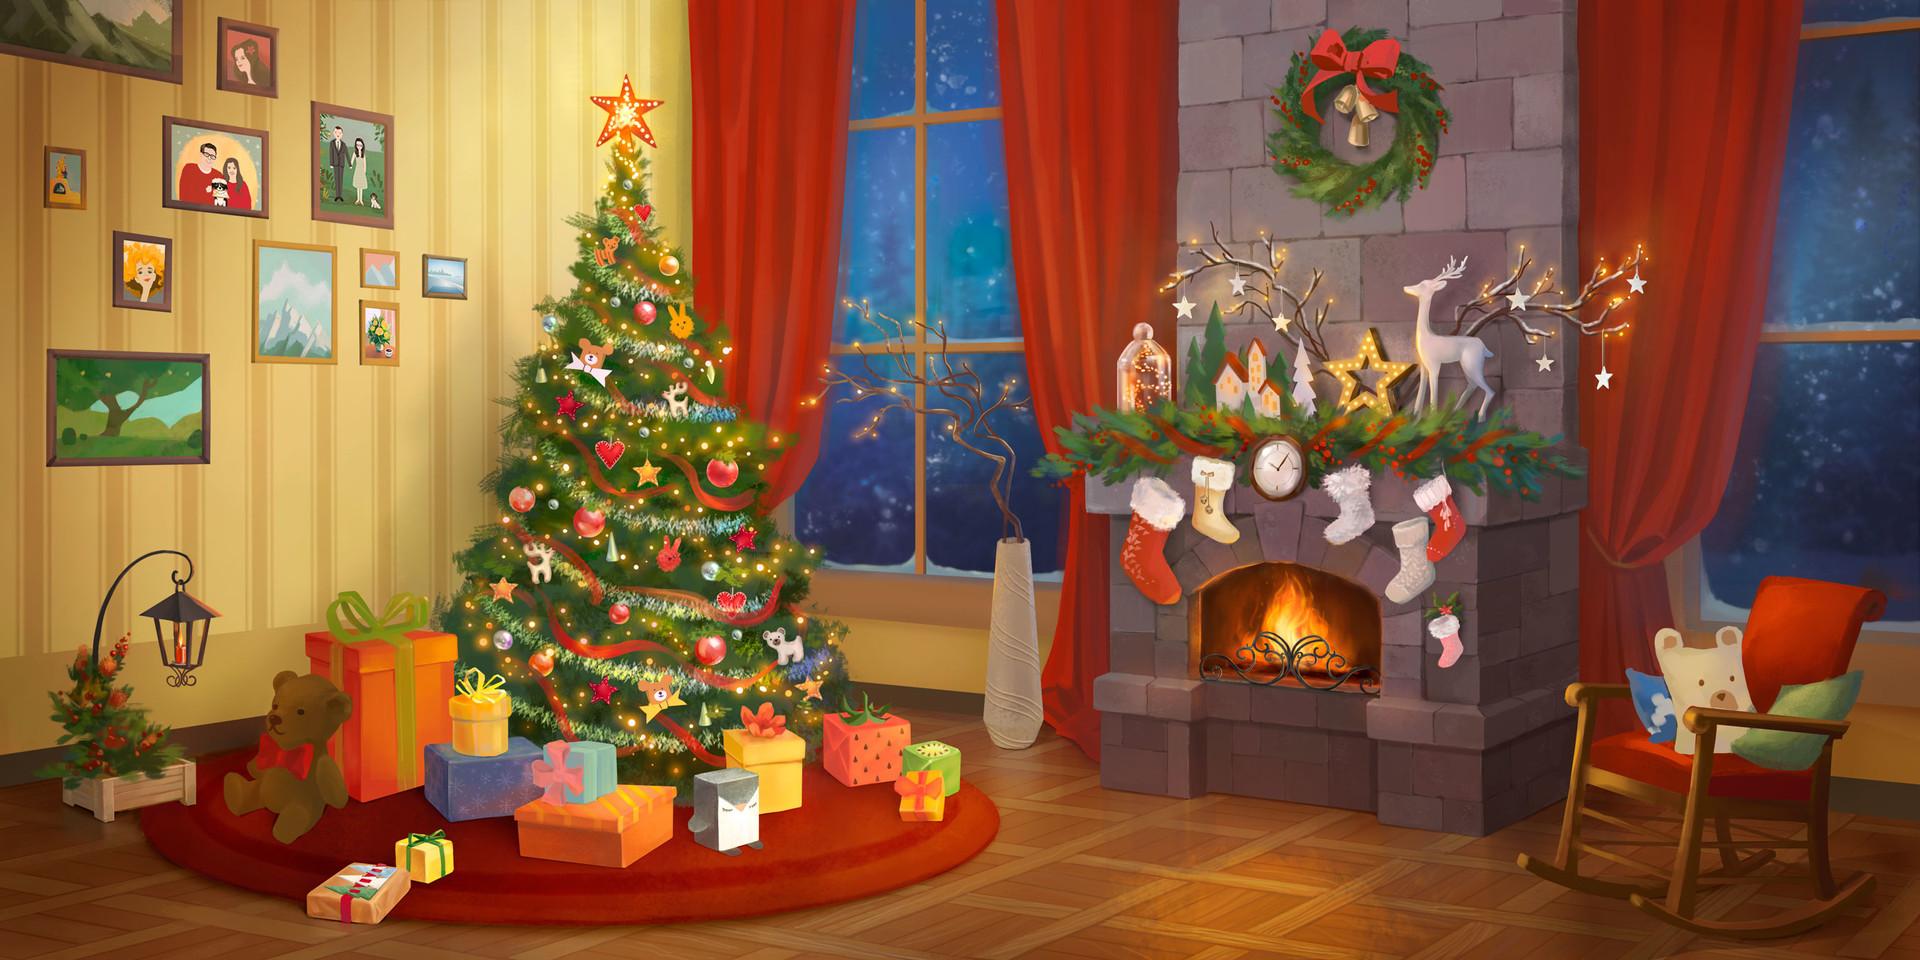 ArtStation - Christmas interior scene, Maria Romanova